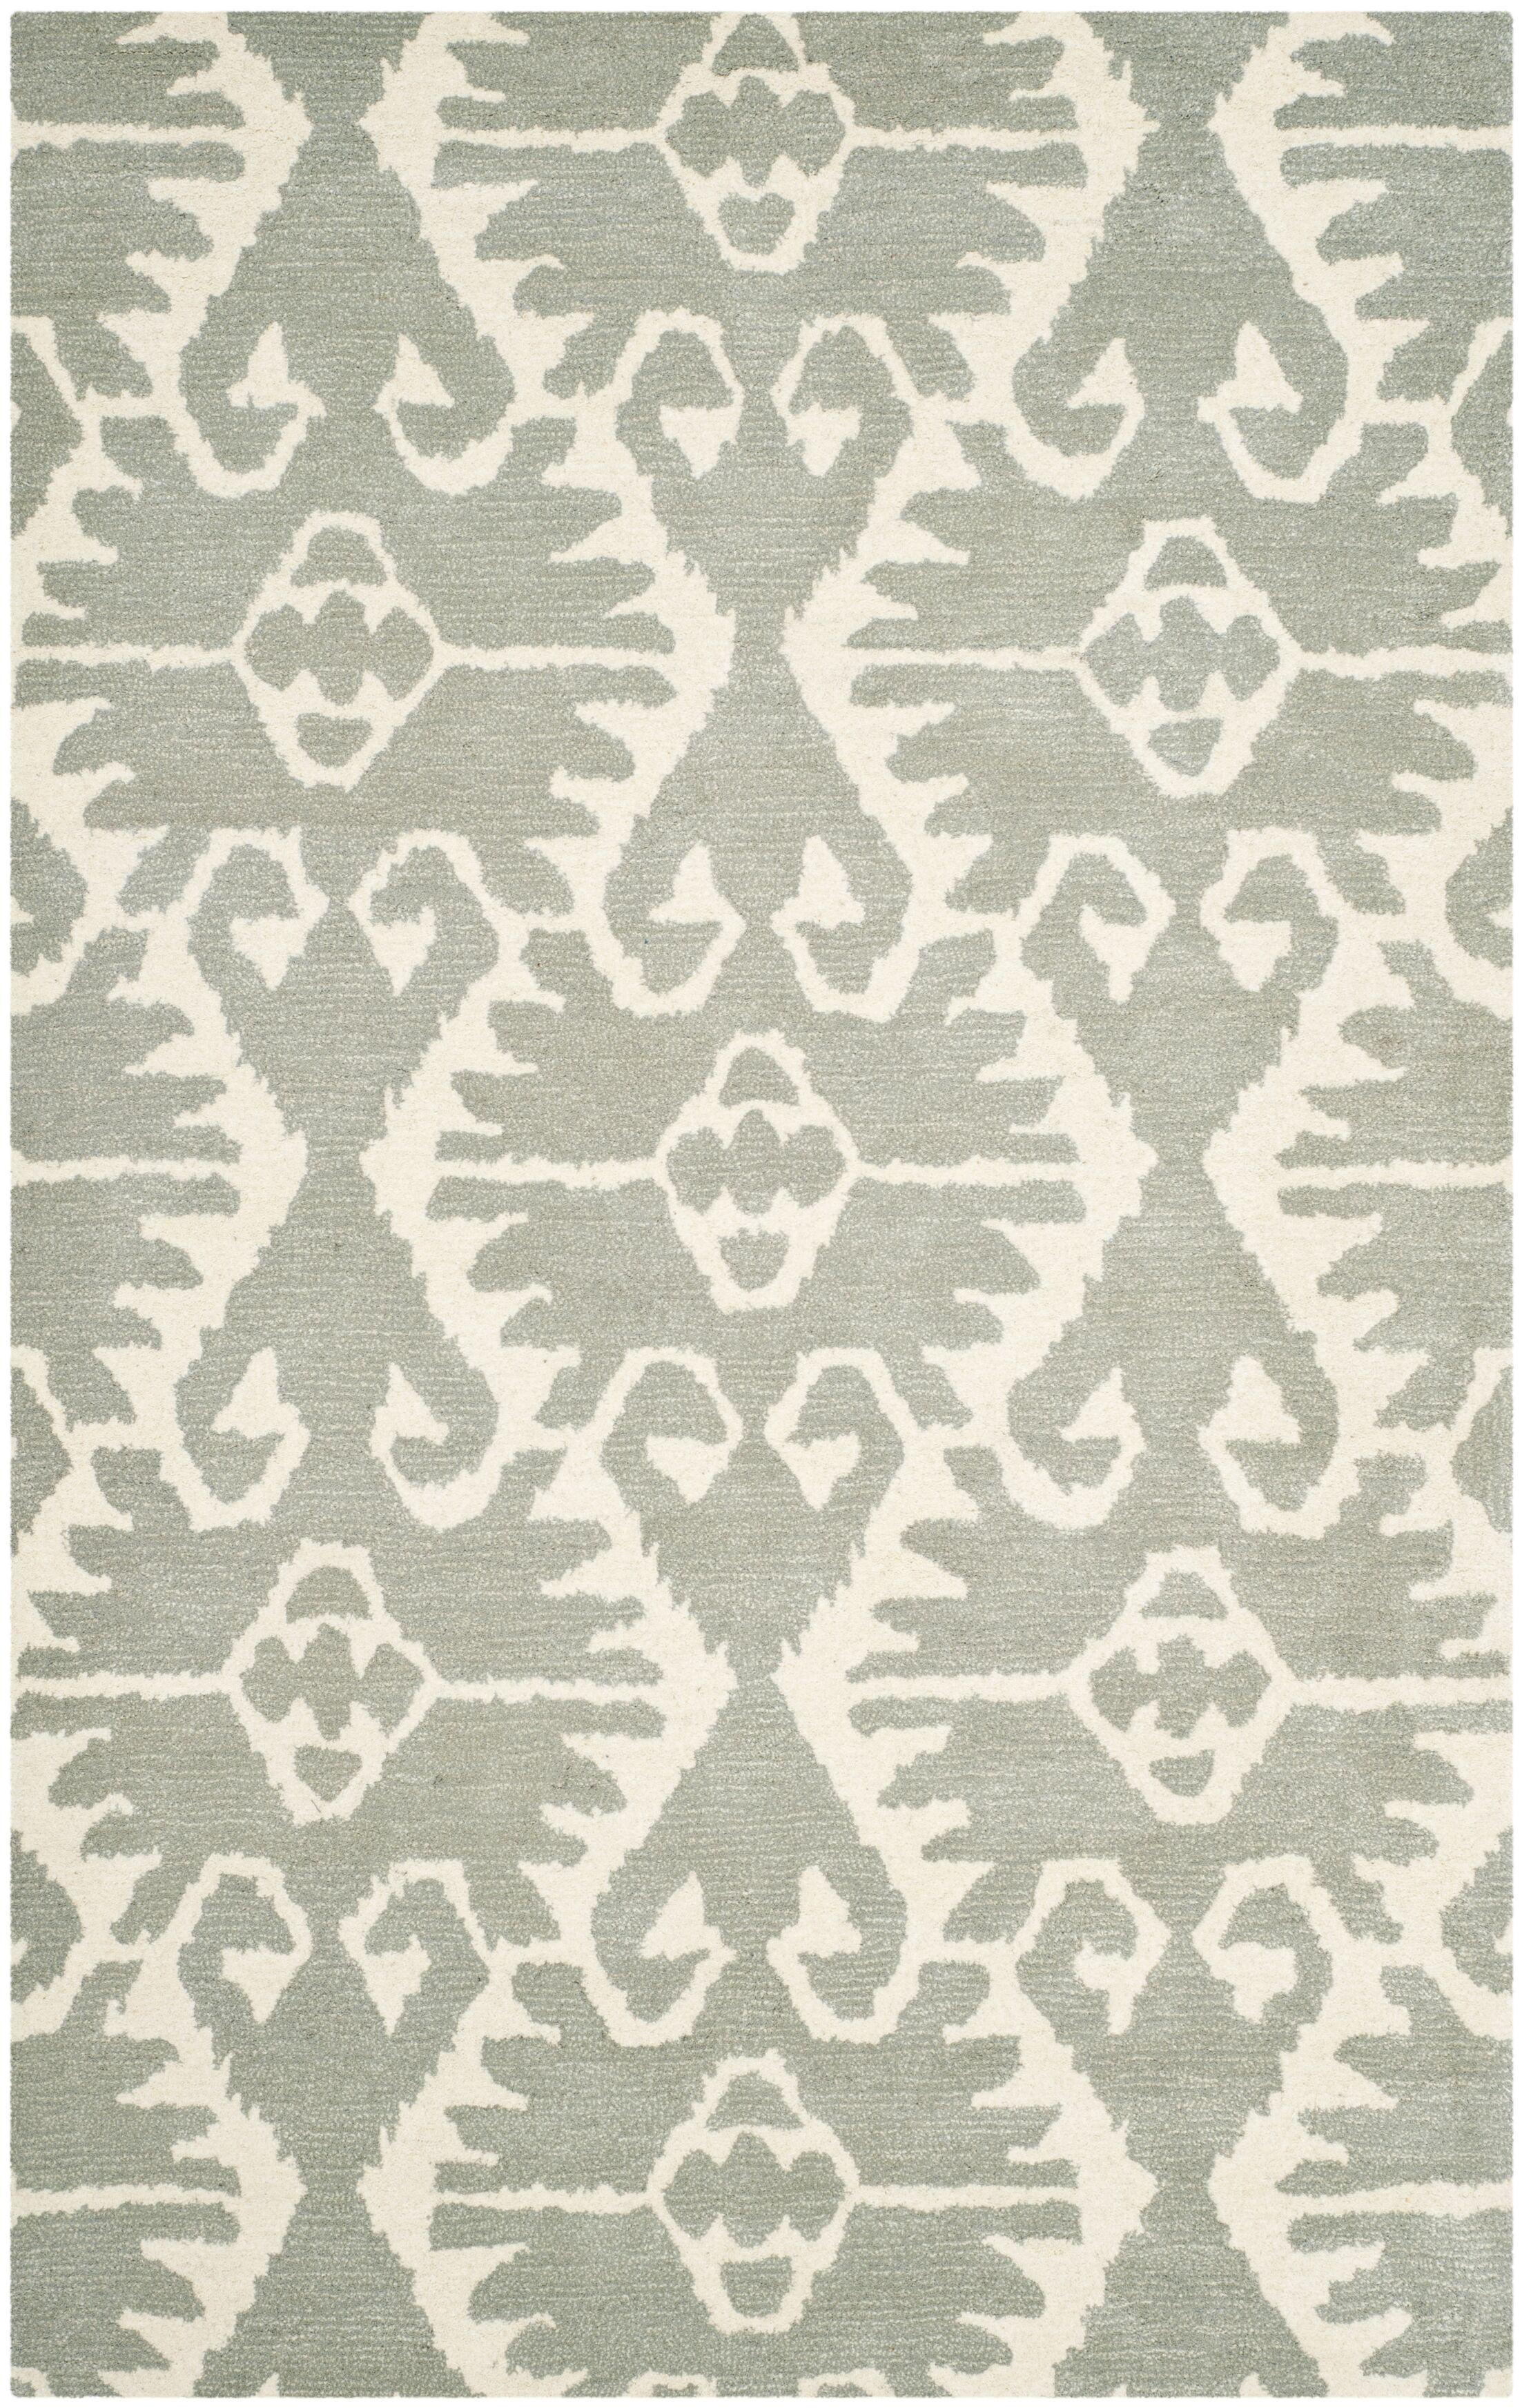 Kouerga Gray/Ivory Area Rug Rug Size: Rectangle 6' x 9'